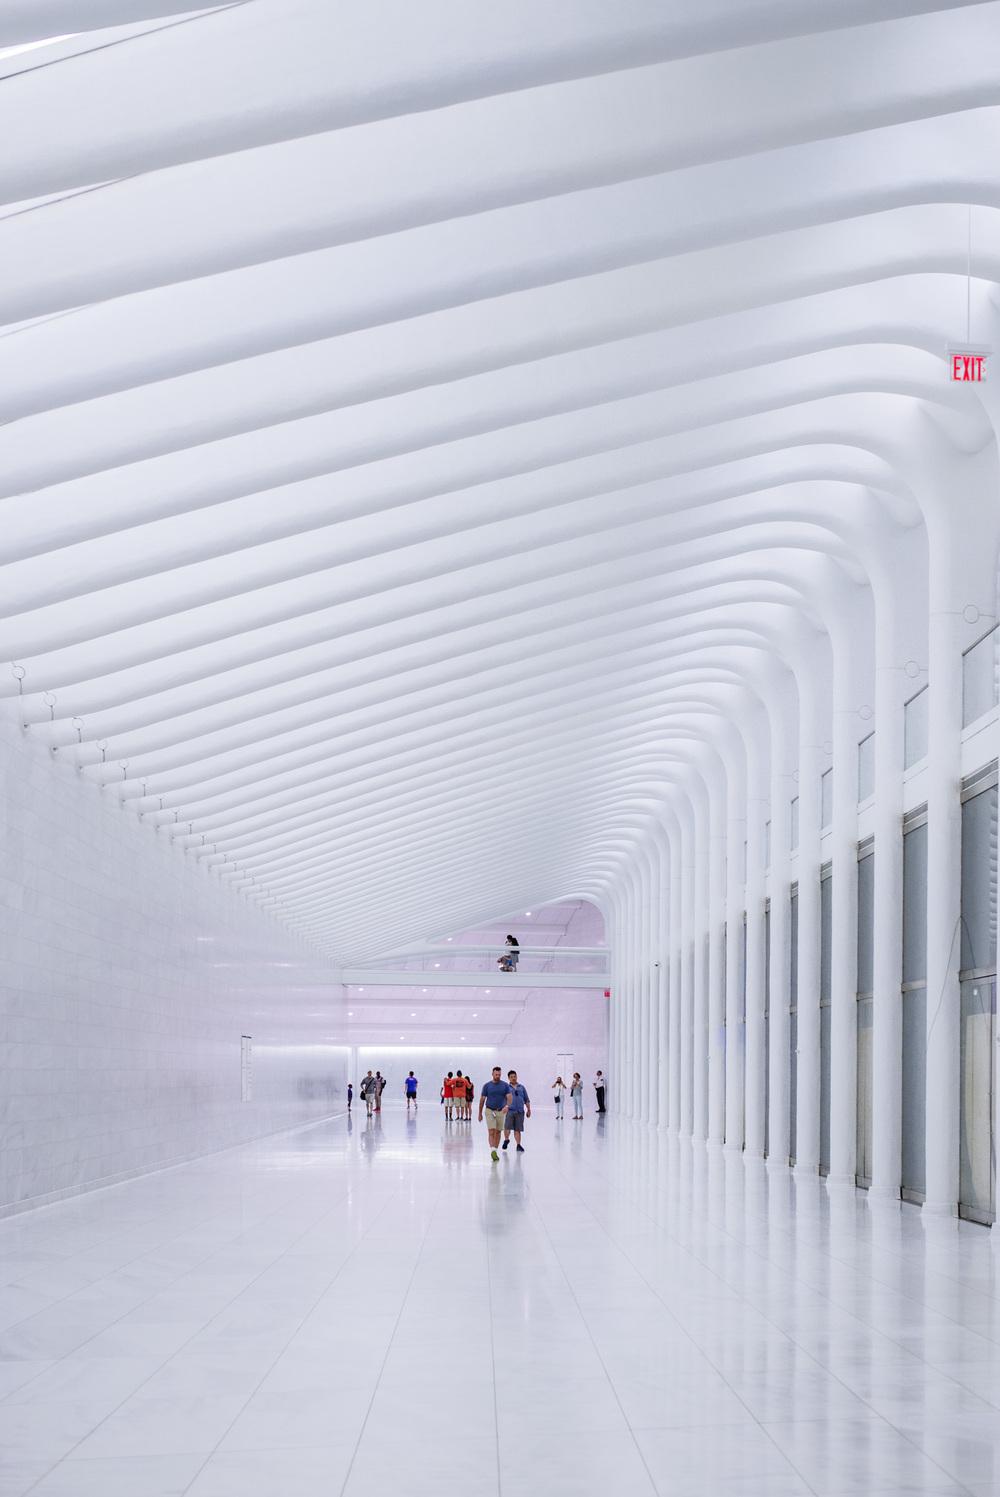 PATH Terminal Tunnel by Santiago Calatrava